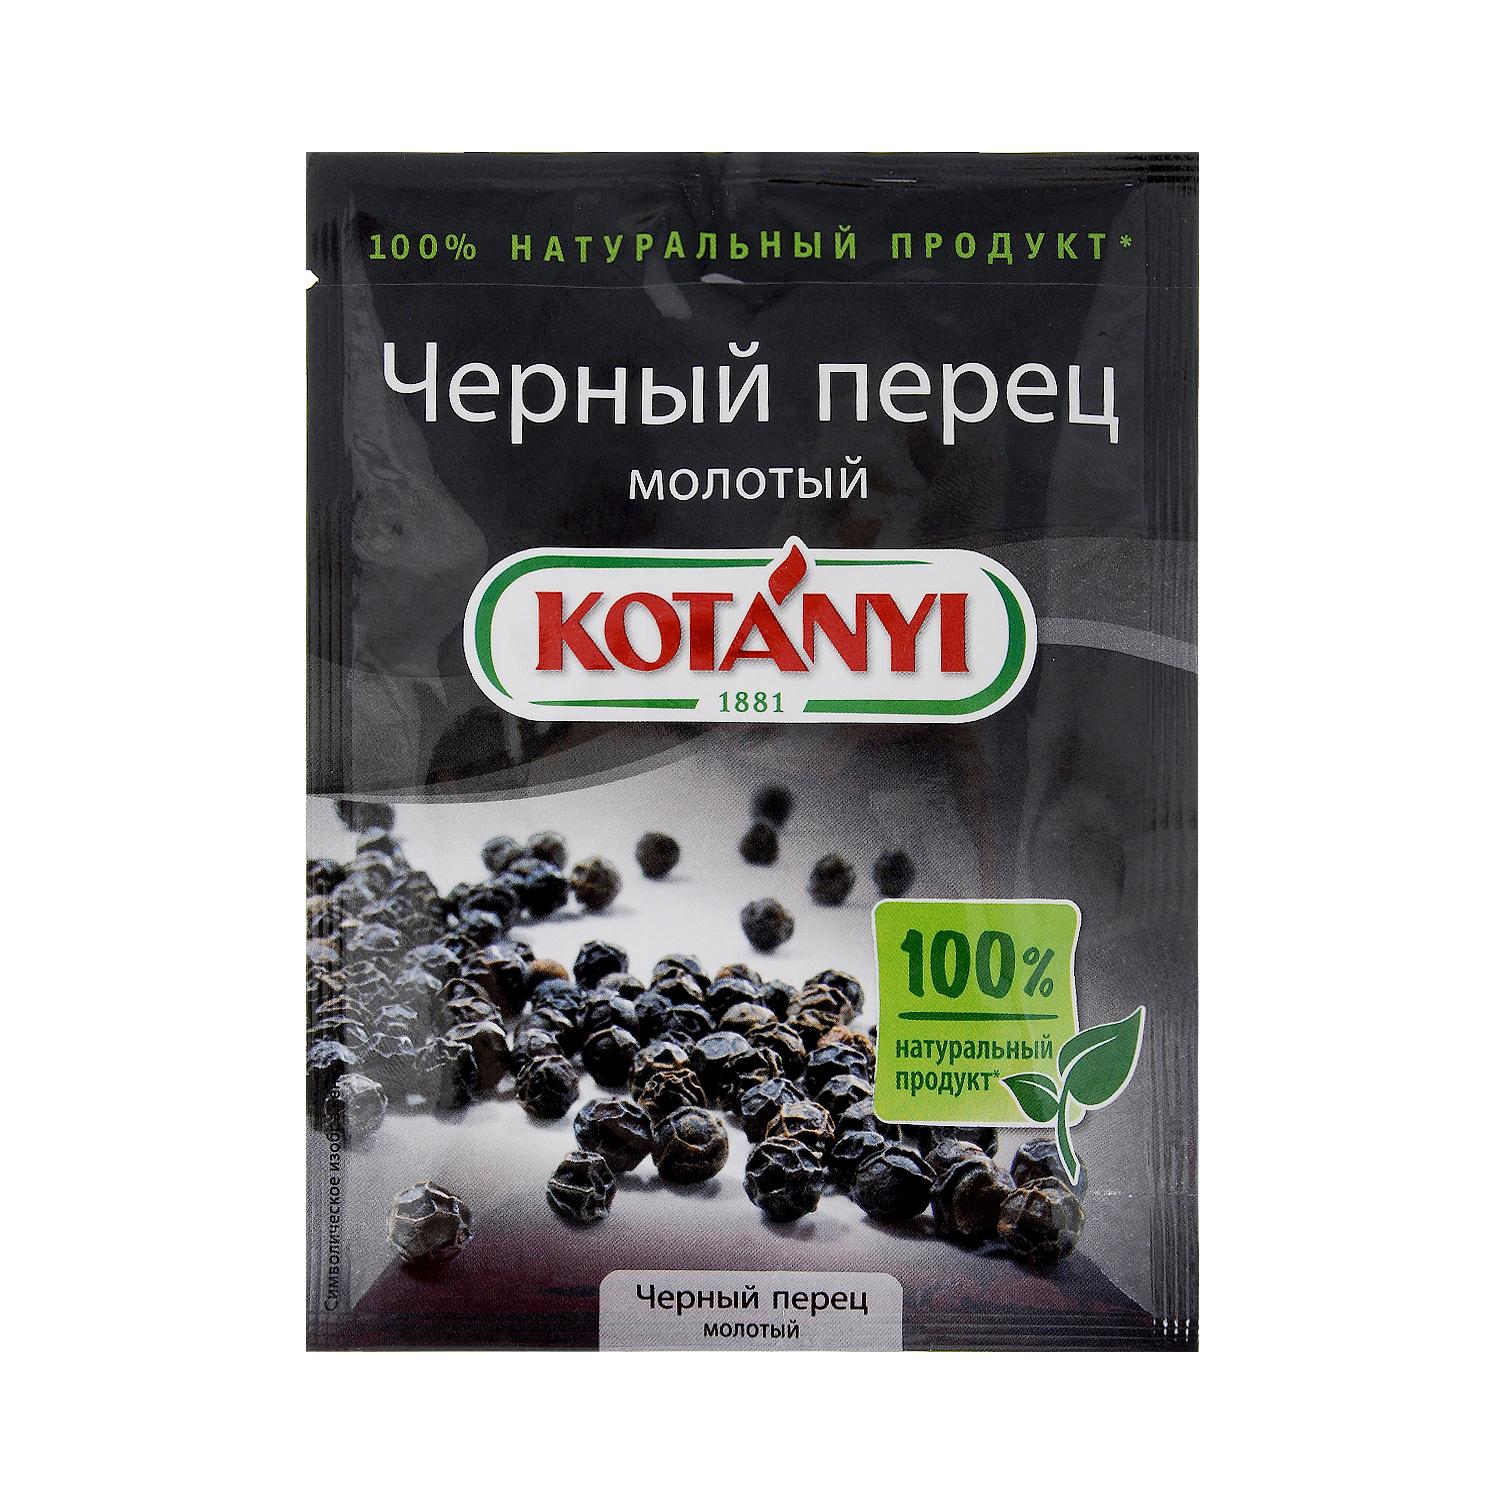 Перец черный молотый Kotanyi 20 г перец черный горошек kotanyi 36 г